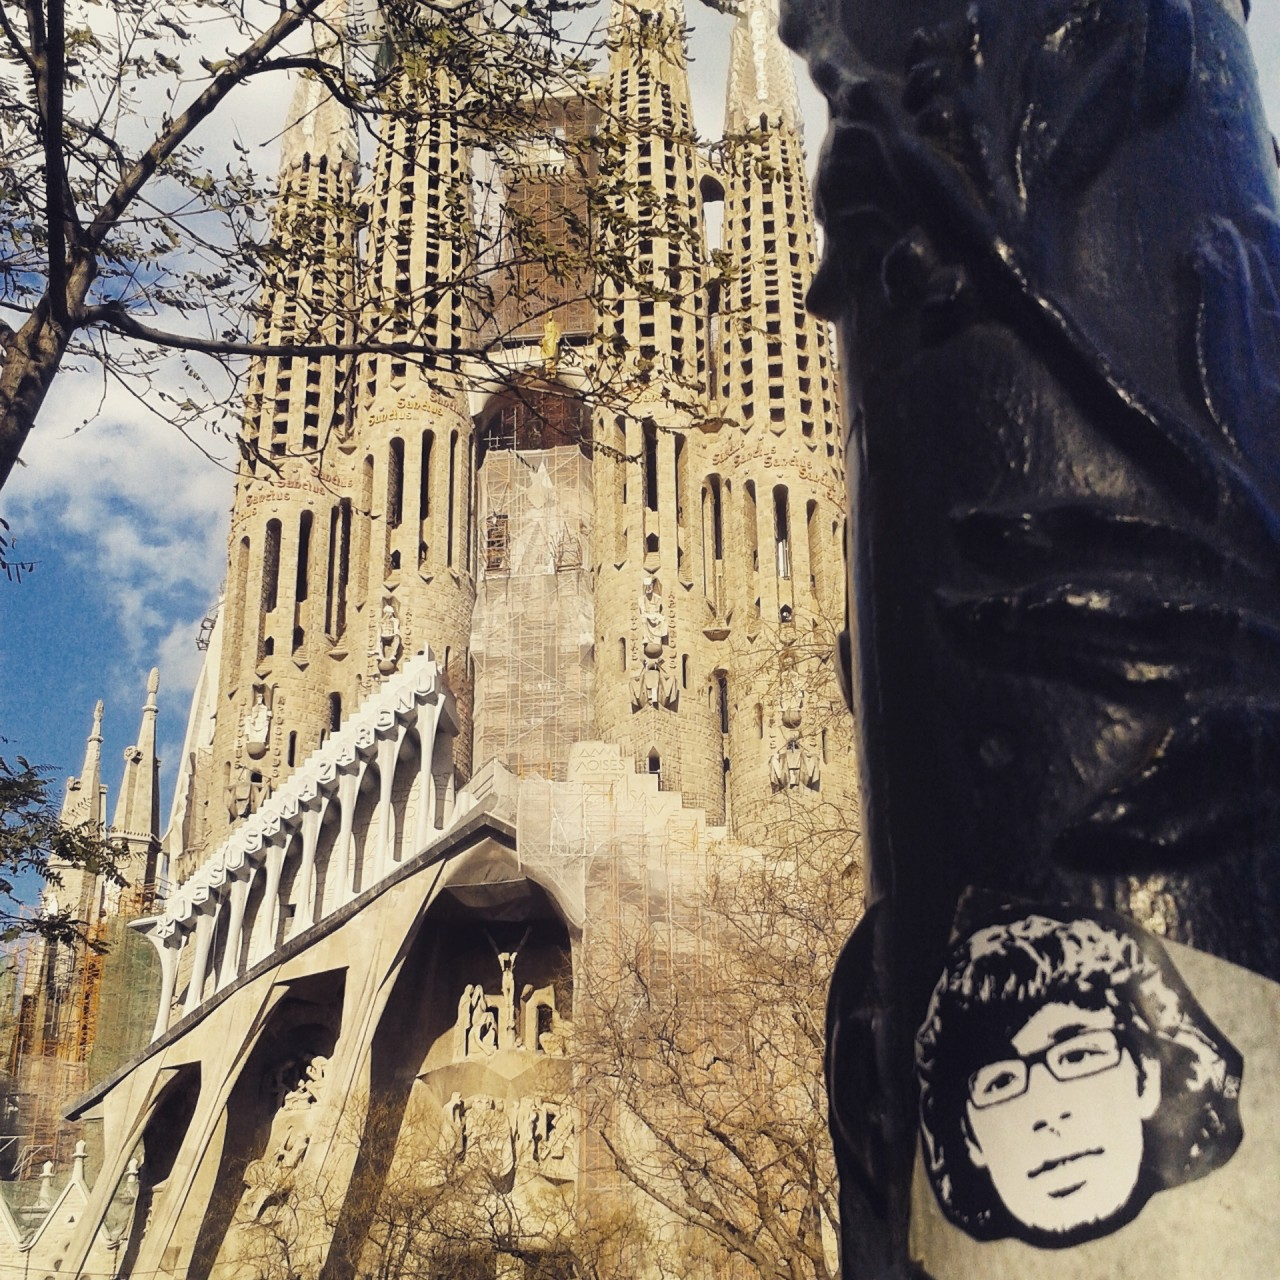 Peipegata sticker slap stickerart  bombardeando Barcelona-España